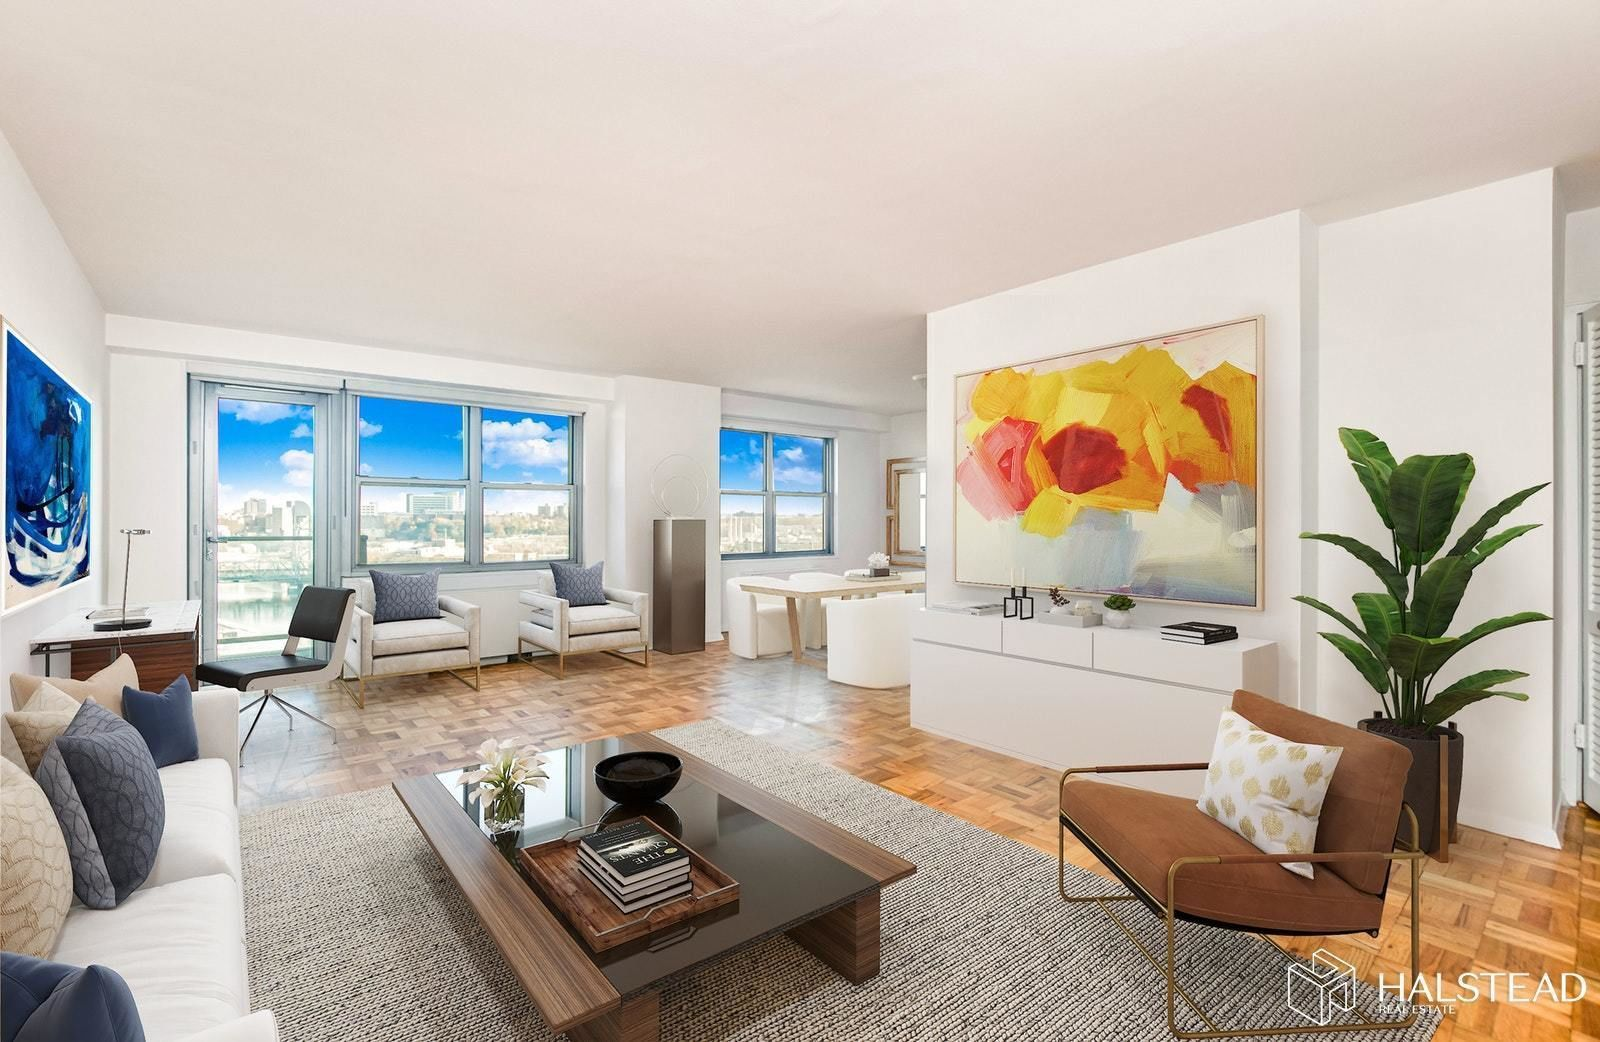 Apartment for sale at 2500 Johnson Avenue, Apt 8P